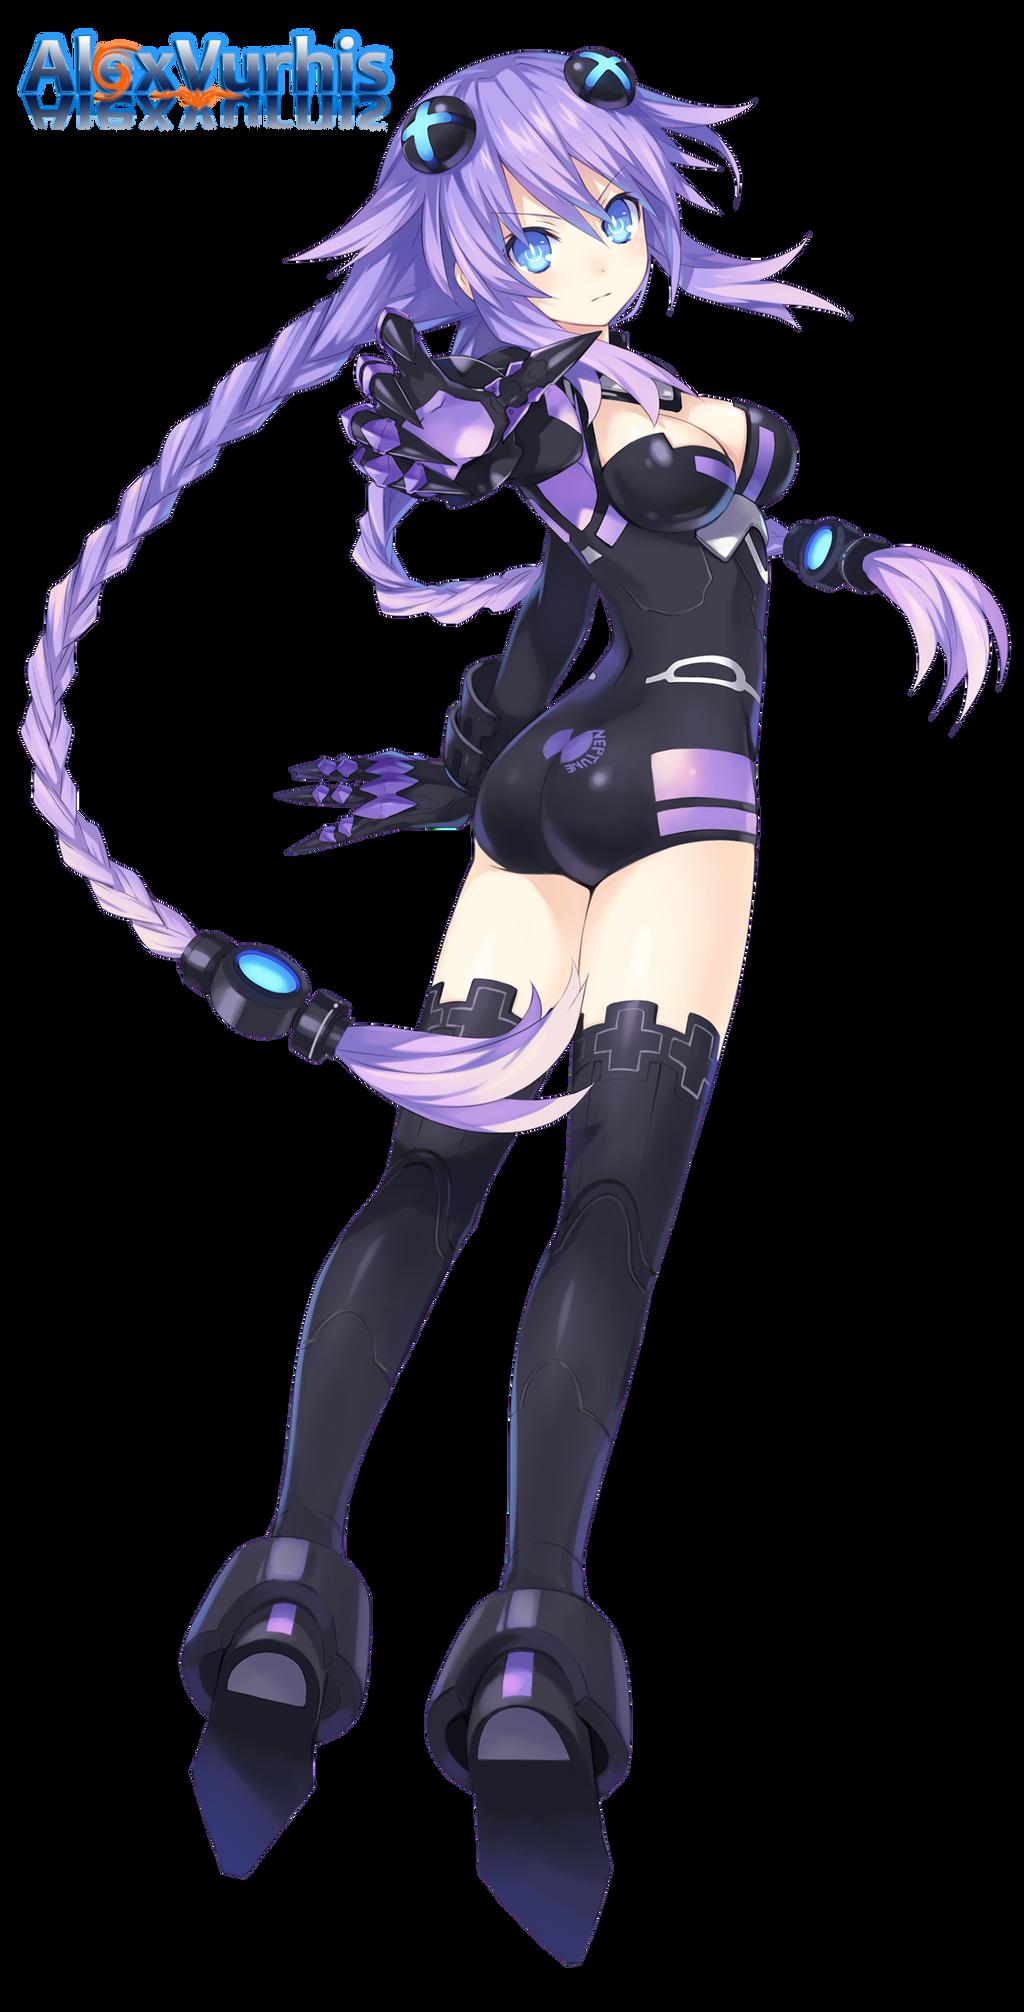 Hyperdimension Neptunia Re Birth 1 Purple Heart By Alexvurhis On